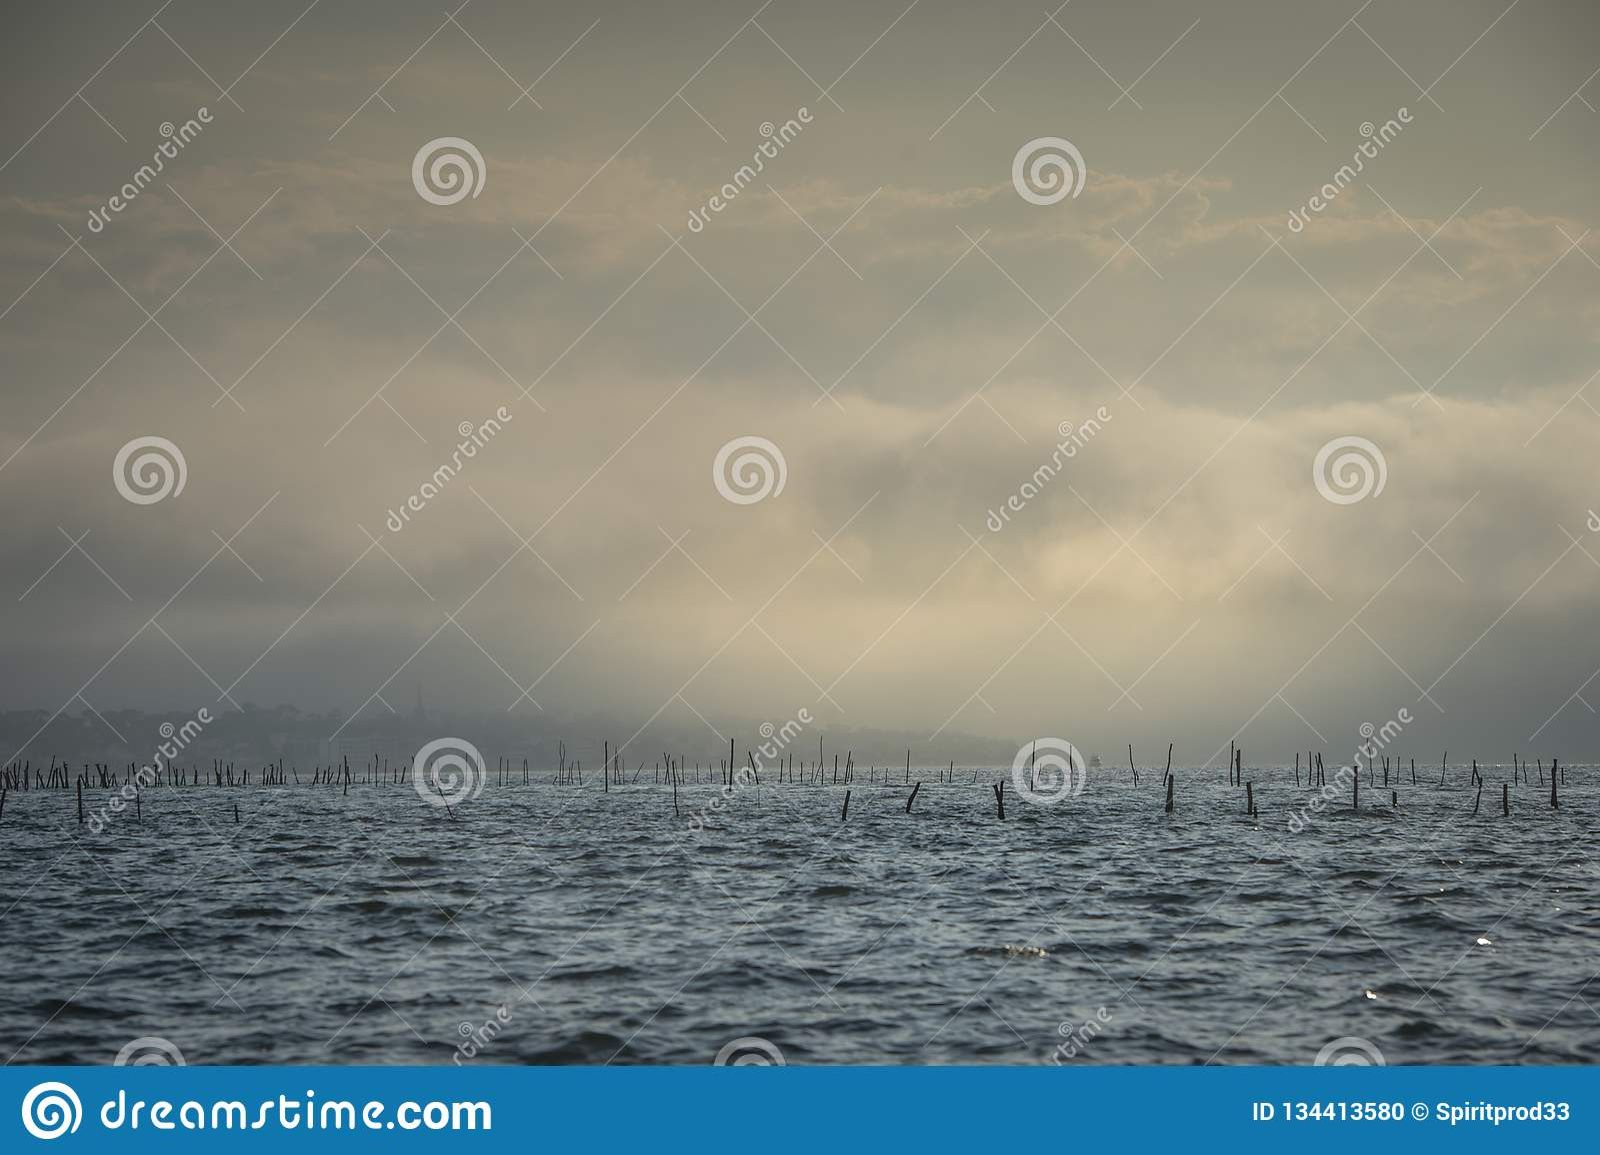 Bateau en brouillard baie dans océan, Arcachon, la Gironde, France